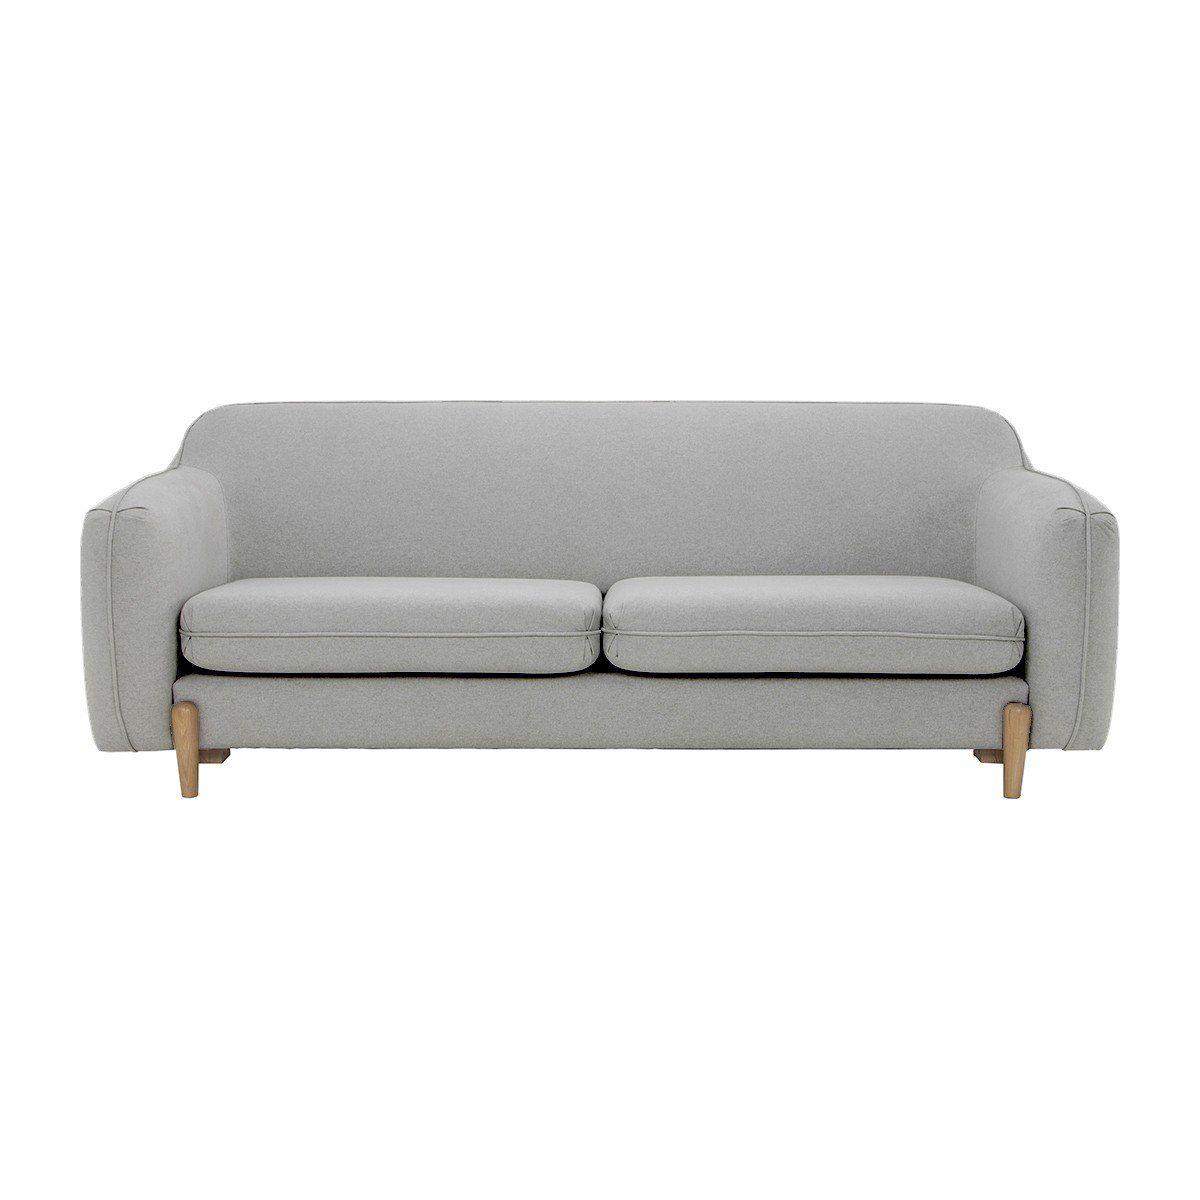 Life Interiors Foldie 3 Seater Sofa Light Grey Modern Sofas